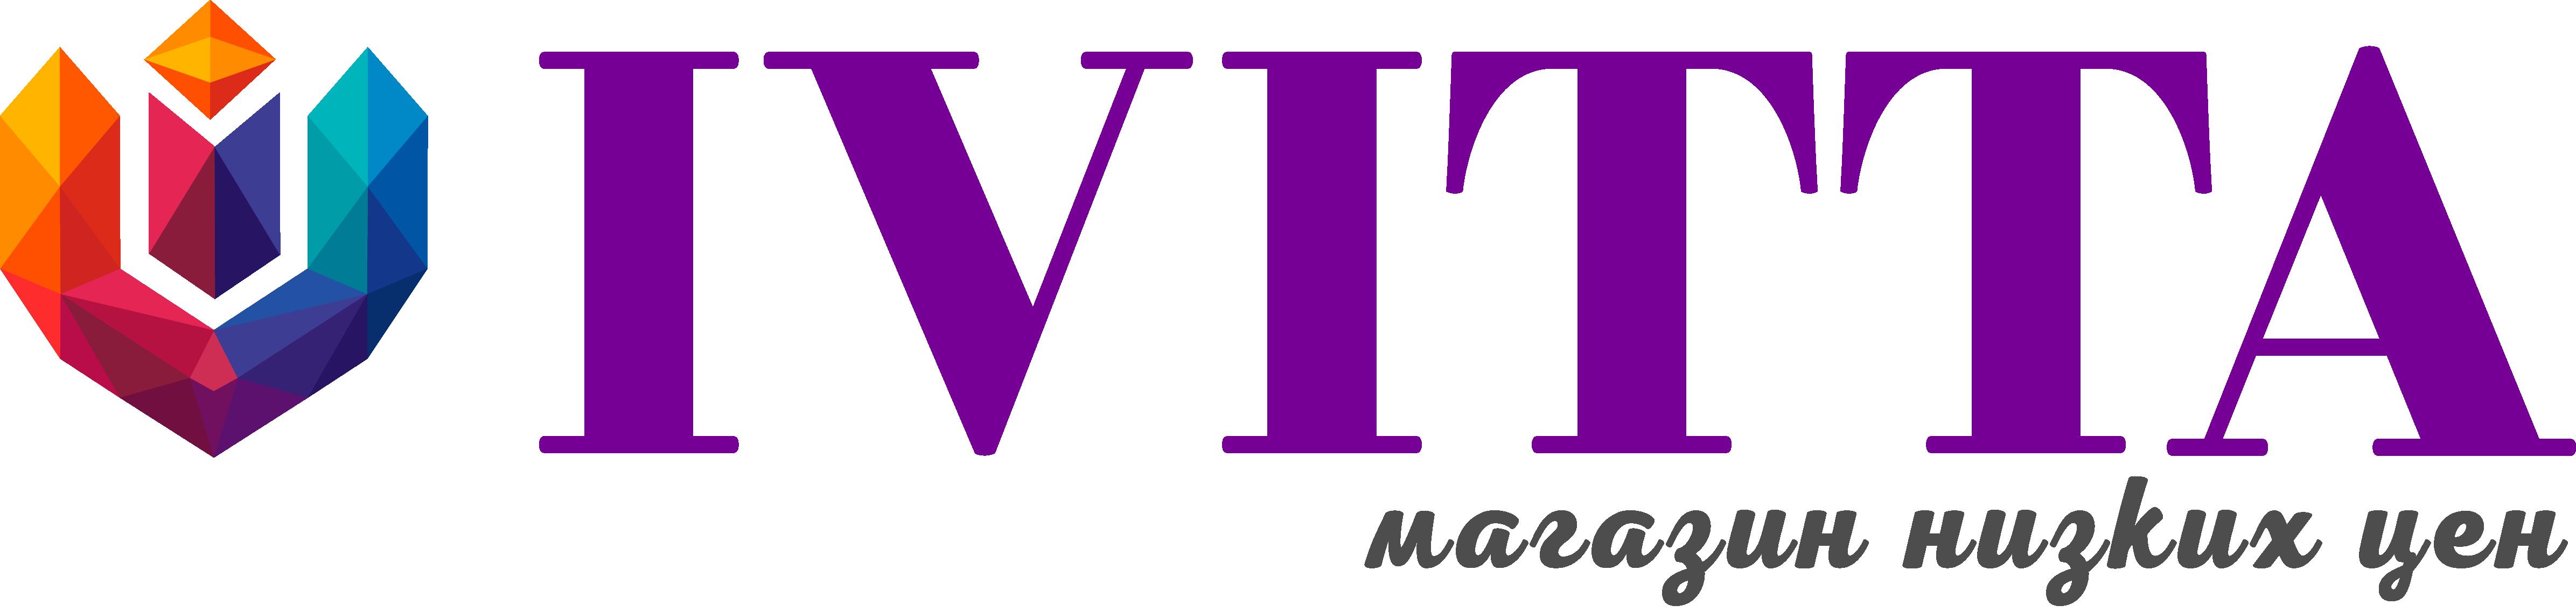 Интернет-магазин Ивитта